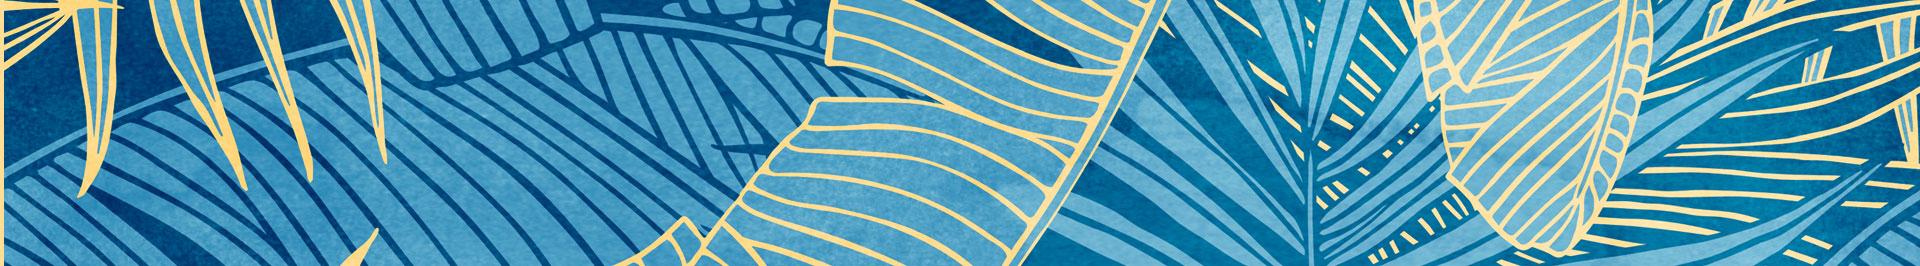 ostras-naiades-pattern-zerouno-design